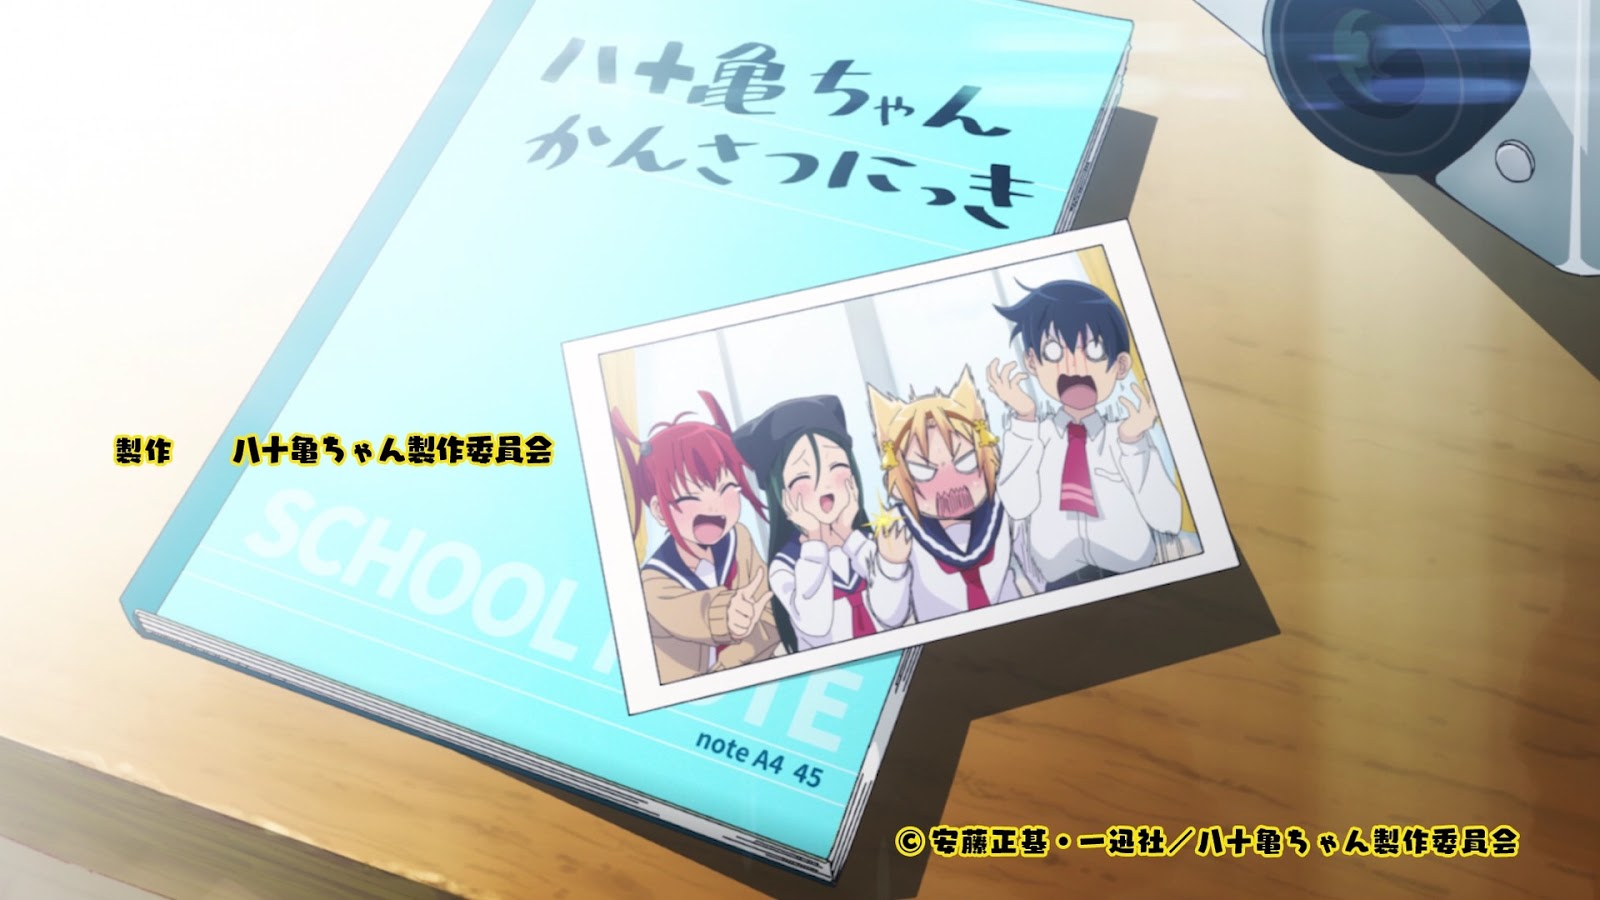 Omake Gif Anime - Yatogame-chan Kansatsu Nikki - Episode 7 - Yatogame Eats Whole Bag